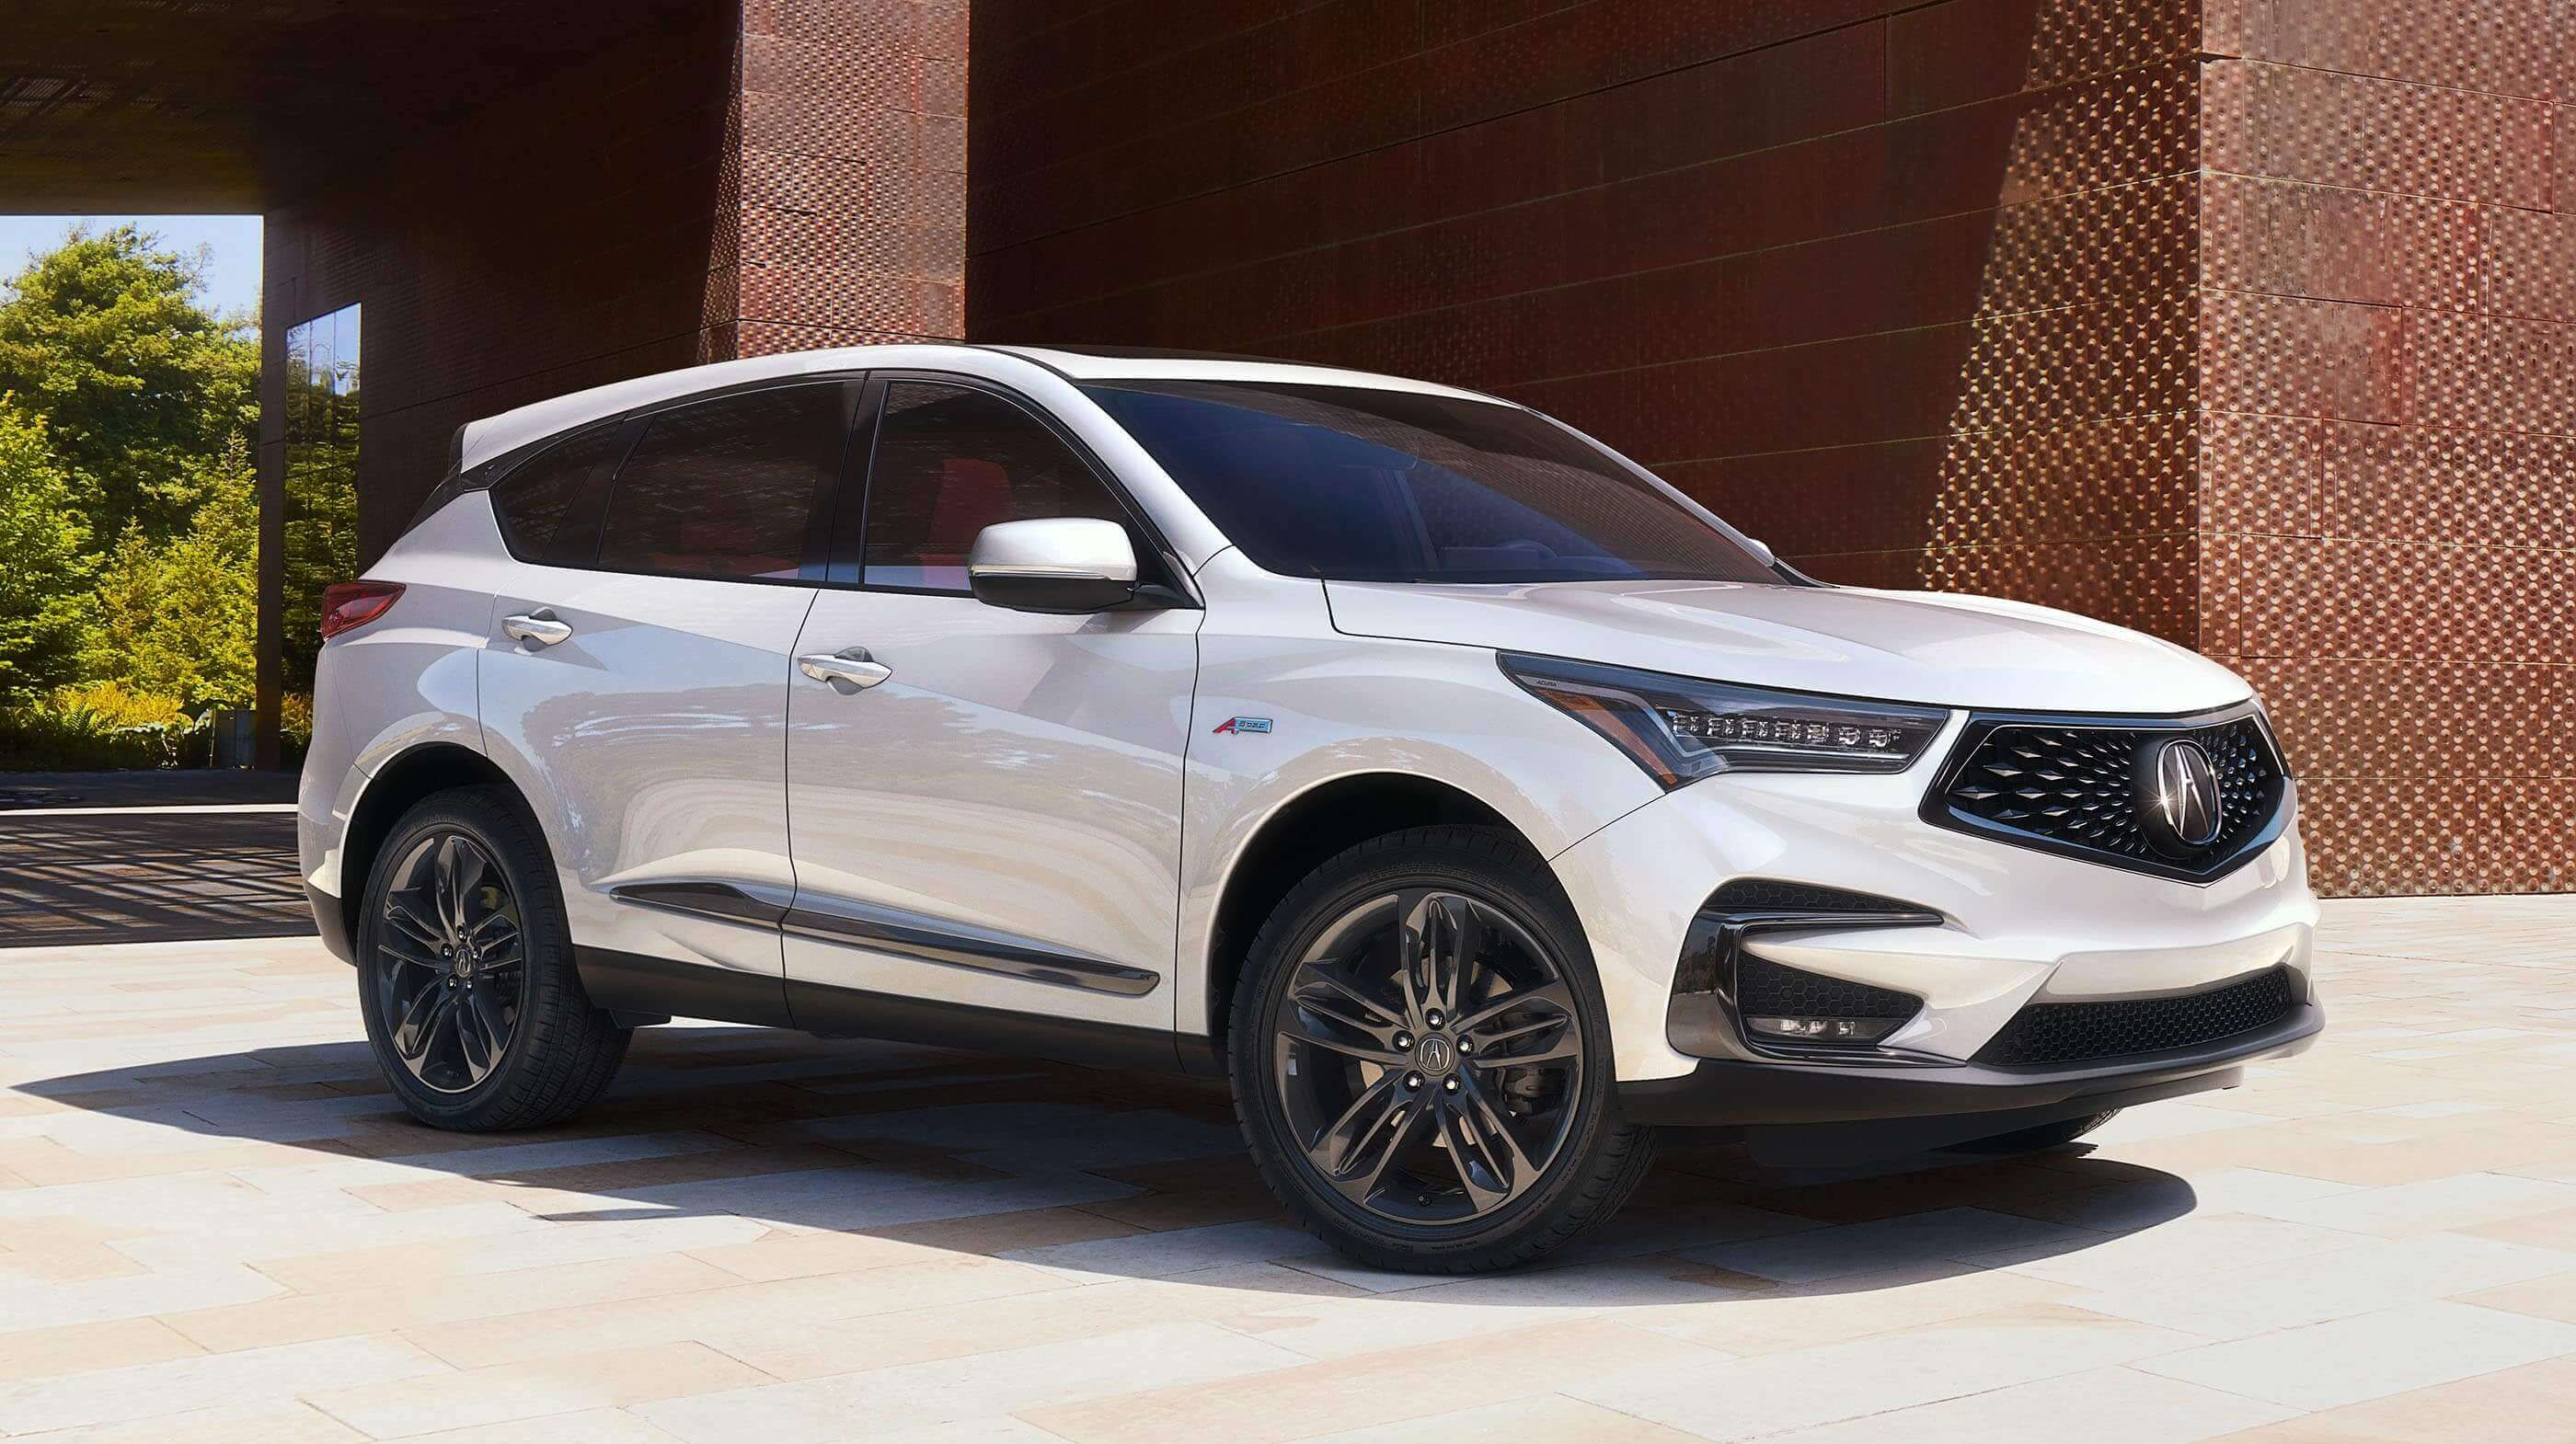 Acura Rdx 2019 Price Reviews And Overviews Findcarsnearme Com Acura Rdx Cars Near Me Suv